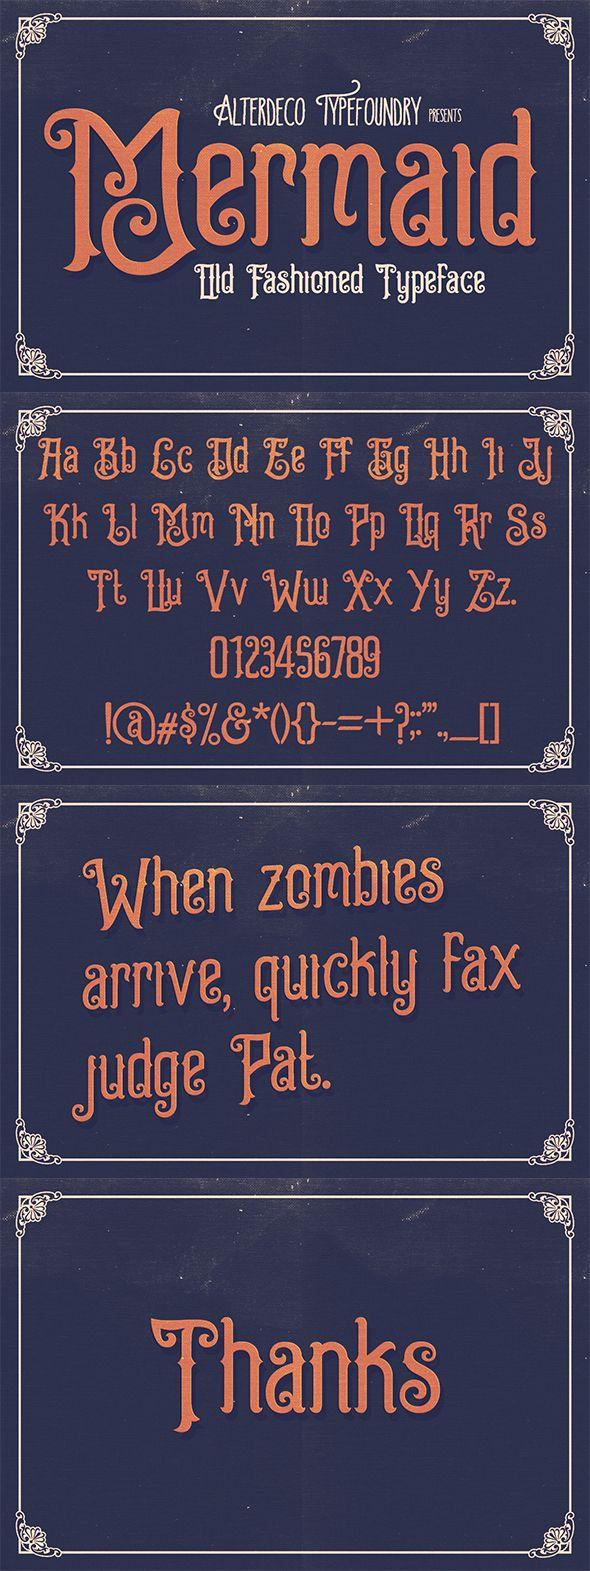 Mermaid Typeface. Download here: http://graphicriver.net/item/mermaid-typeface/16703664?ref=ksioks